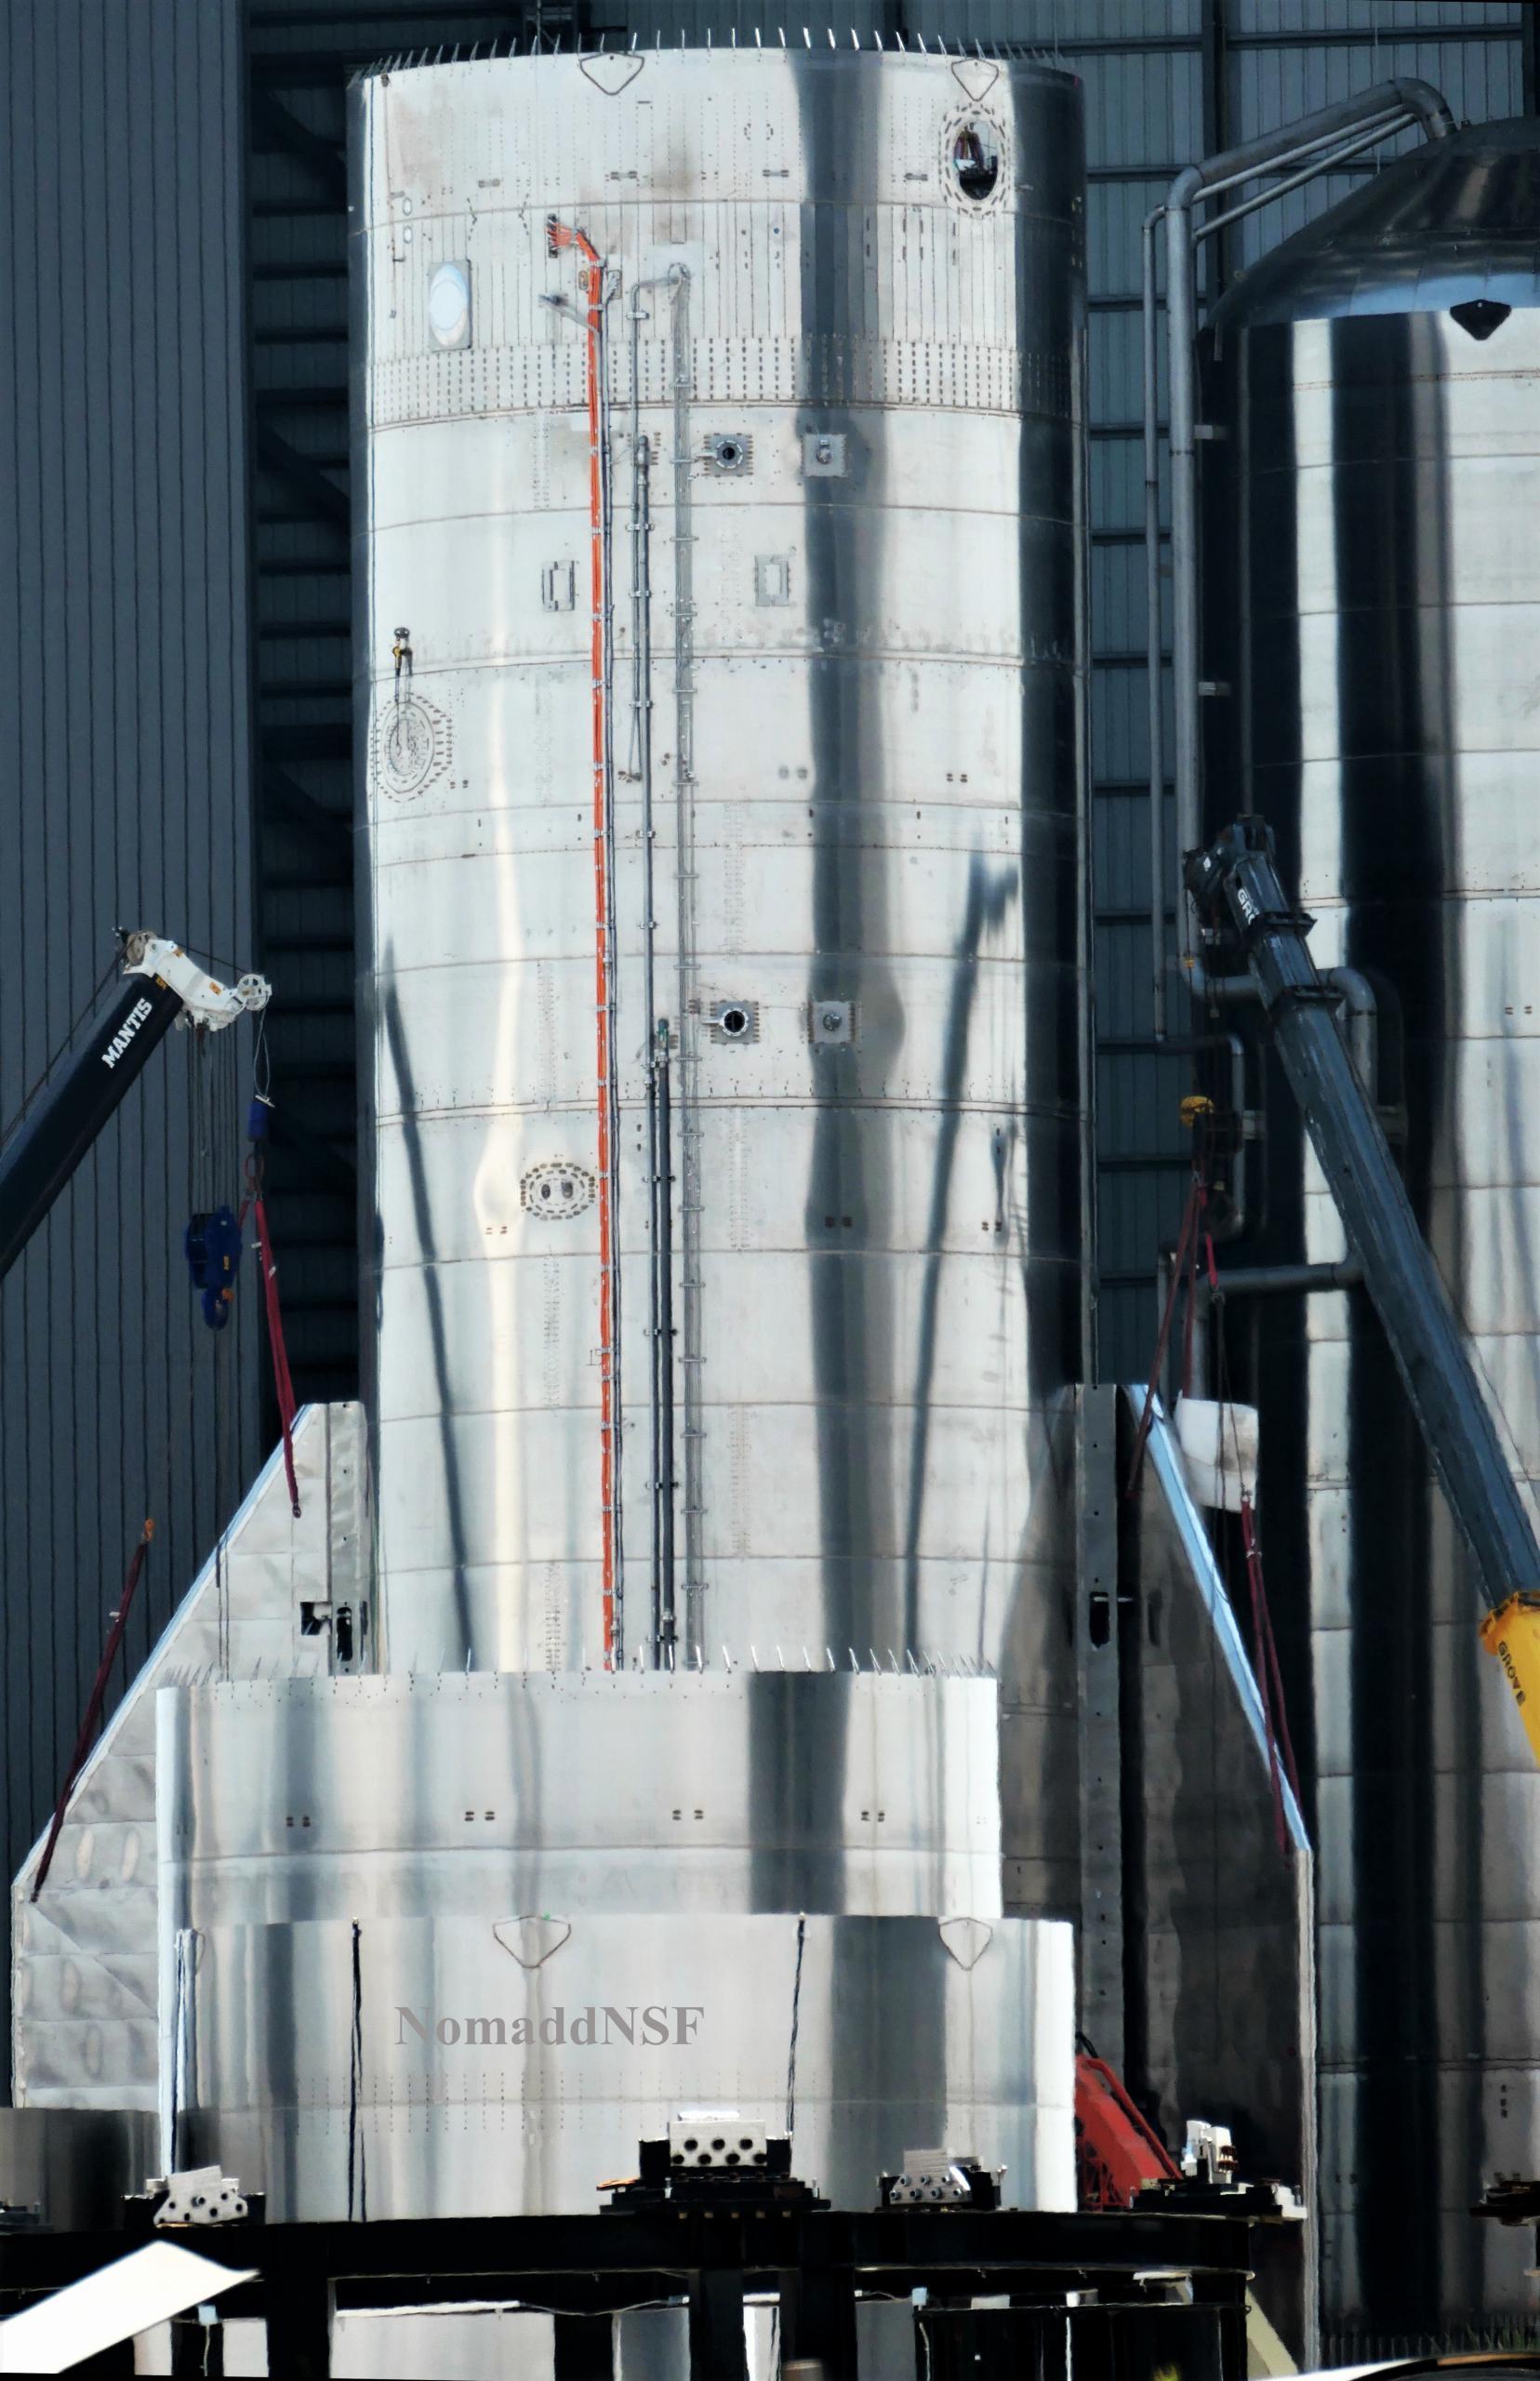 Starship Boca Chica 033121 (NASASpaceflight – Nomadd) SN15 aft flap install + GSE 1 1 edit (c)